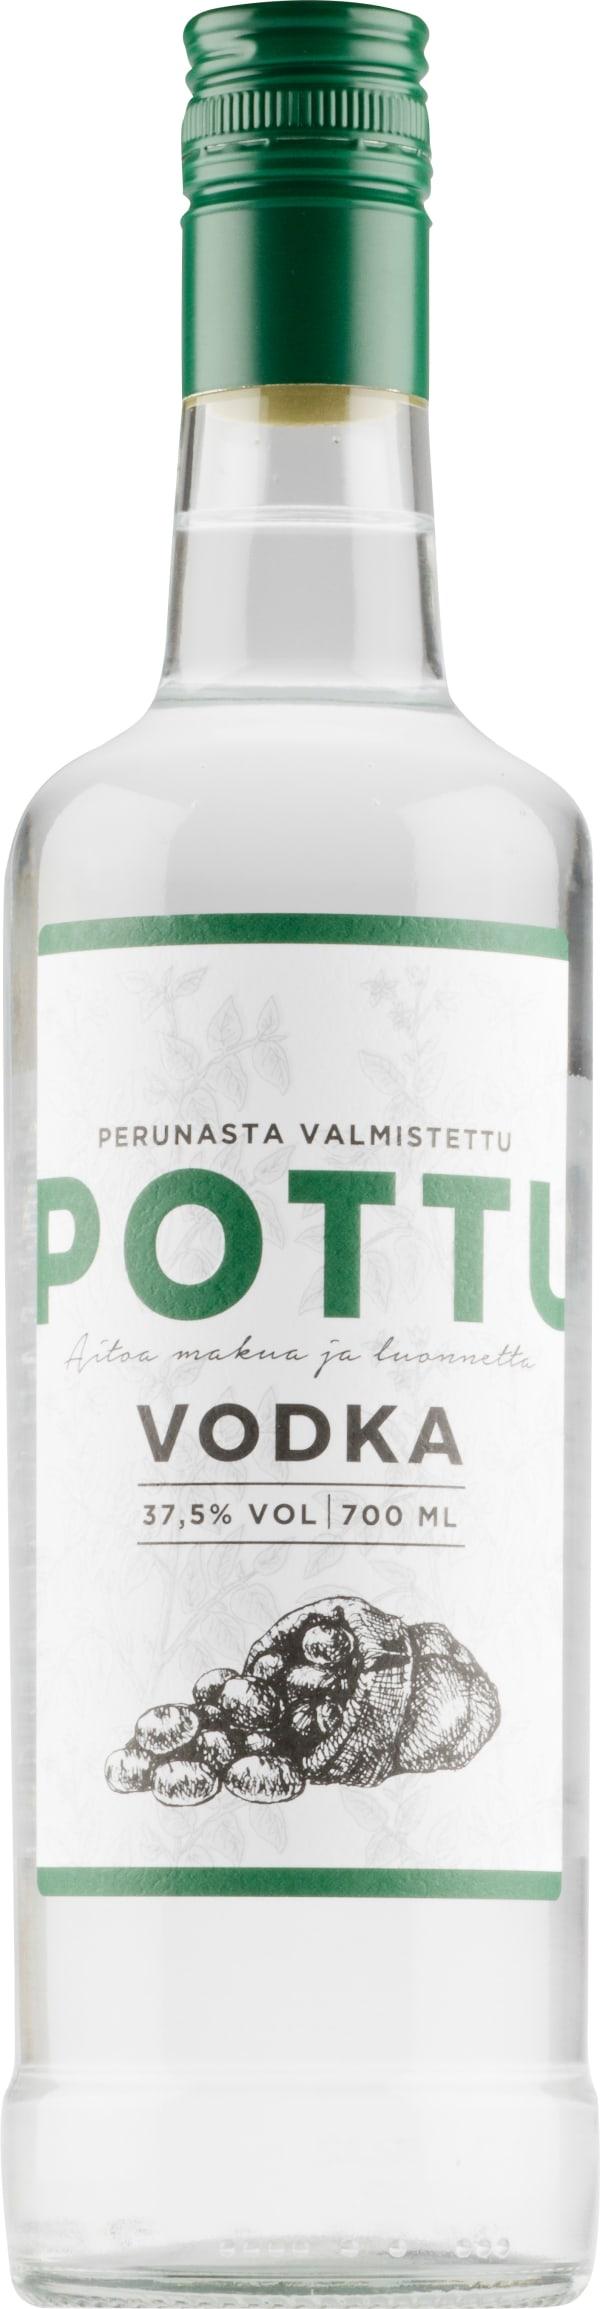 Pottu Vodka